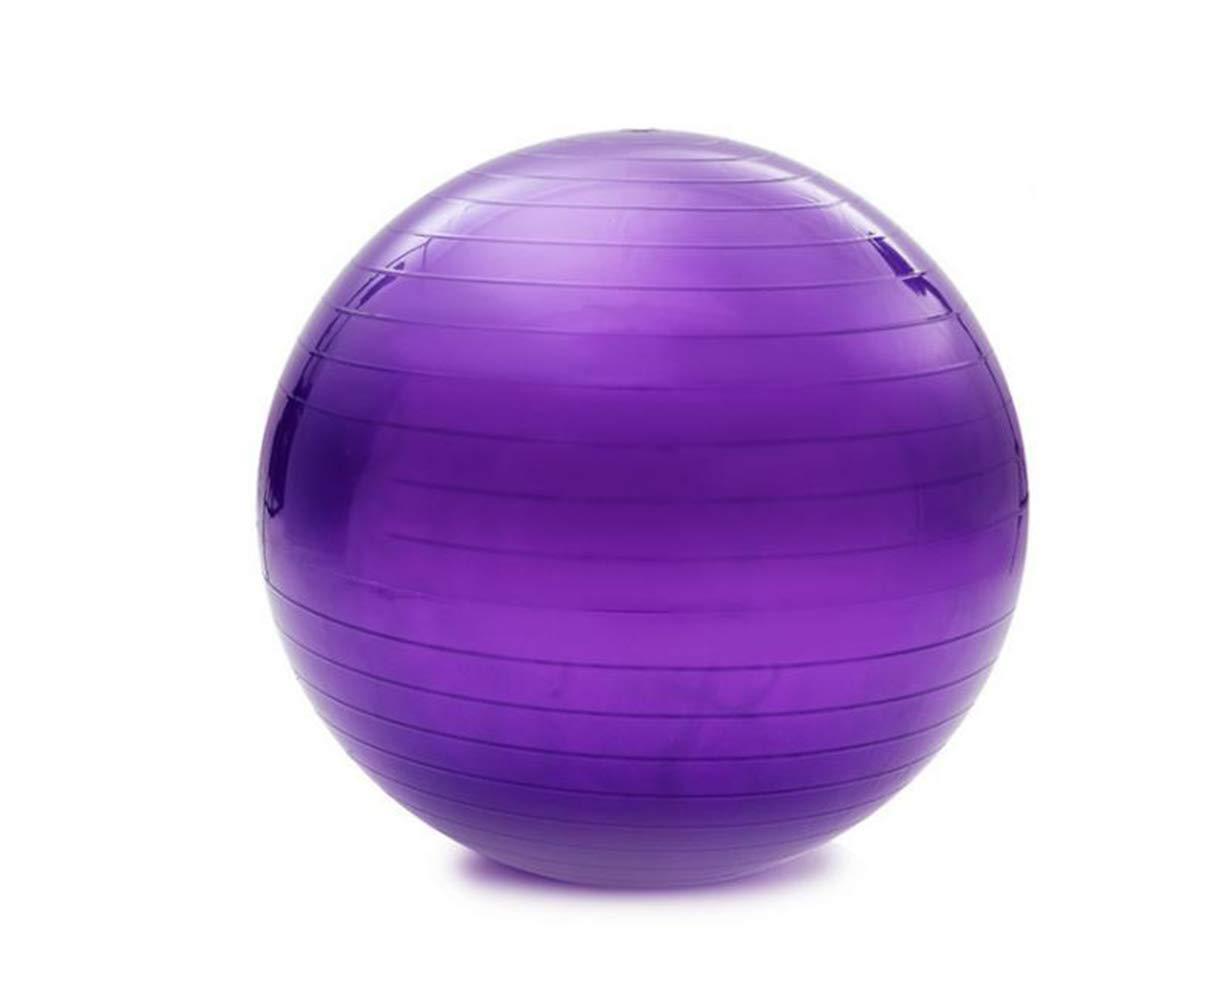 ZSJZHB Yoga Ball, Explosion-Proof Yoga Ball, Inflatable Yoga Ball, PVC Yoga Ball Yoga Ball, Sports Yoga Ball, Non-Slip Yoga Balance Stability, Swiss Ball Fitness Training Core Strength